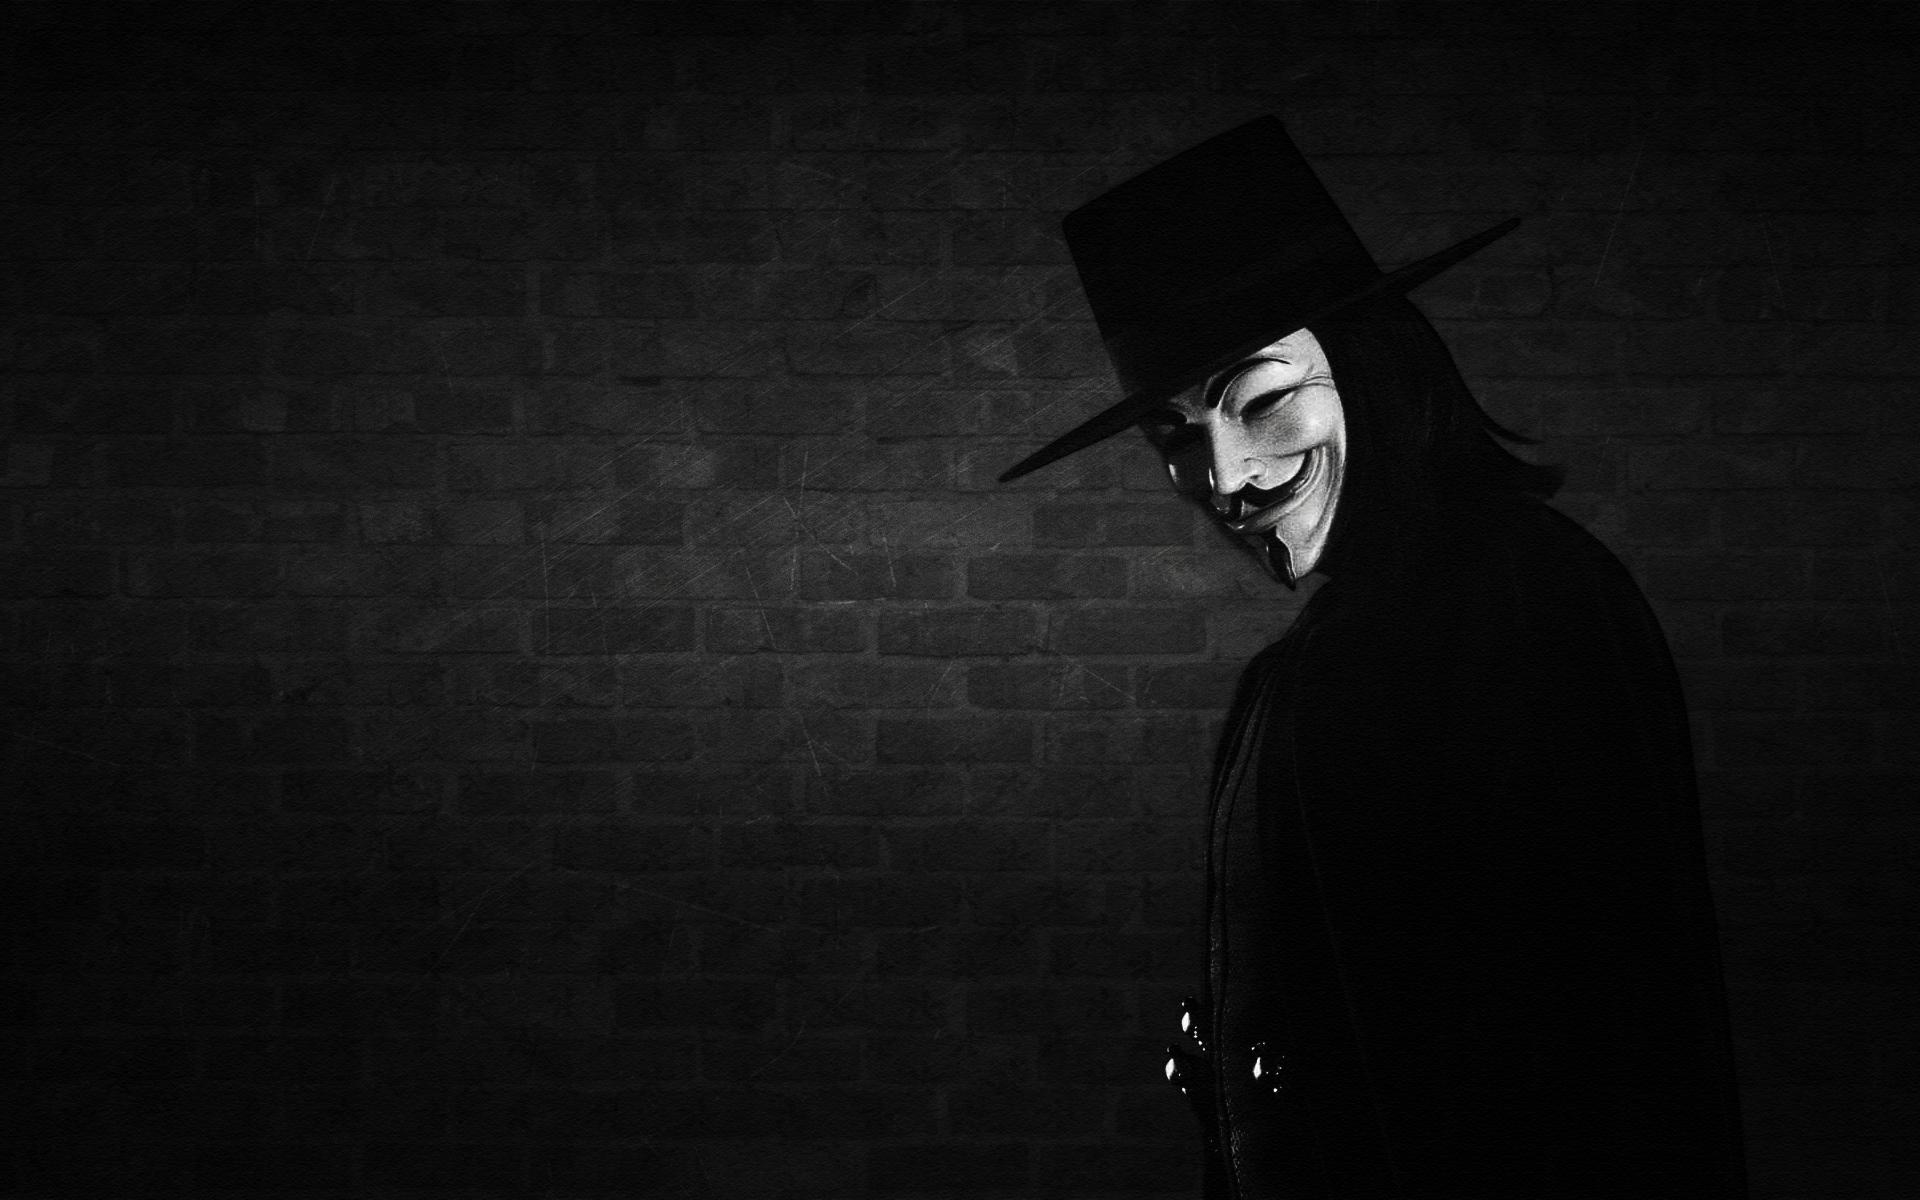 V For Vendetta Mask Wallpaper Quotes mask, V for ven...